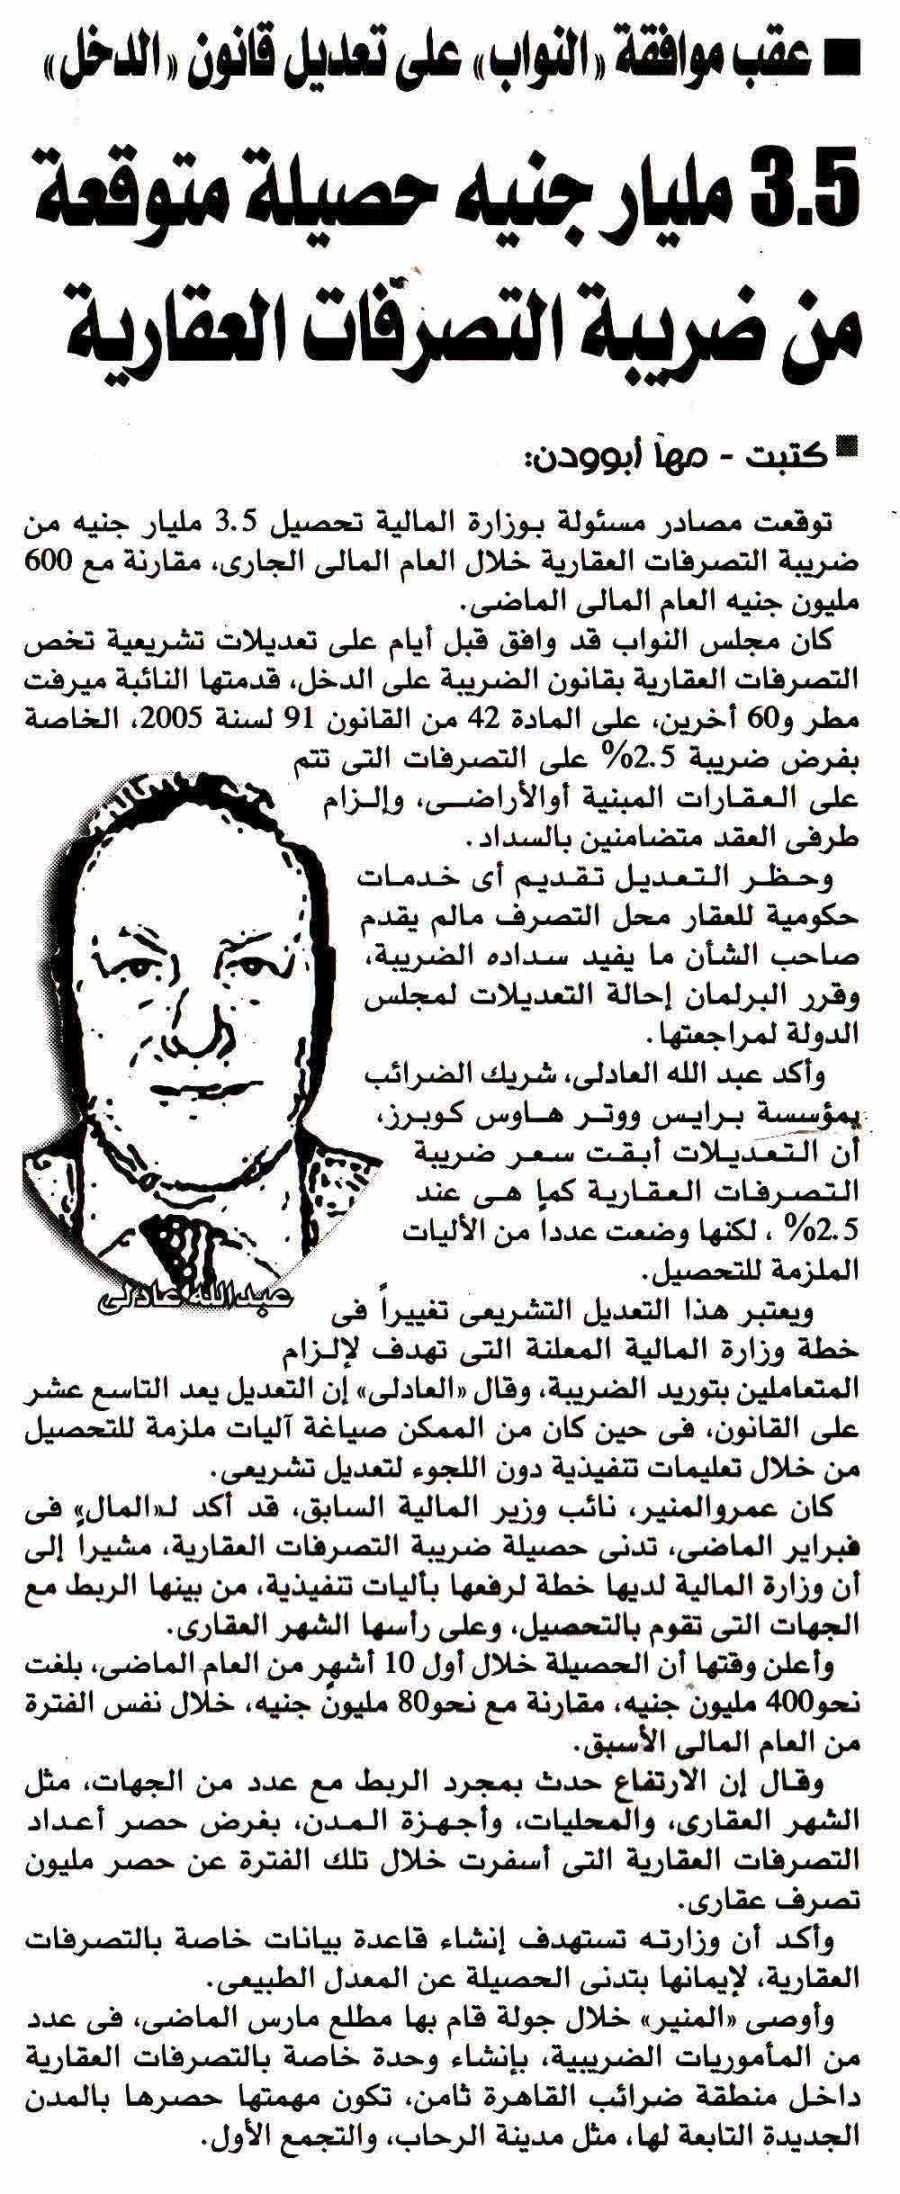 Al Mal 8 July P.1.jpg